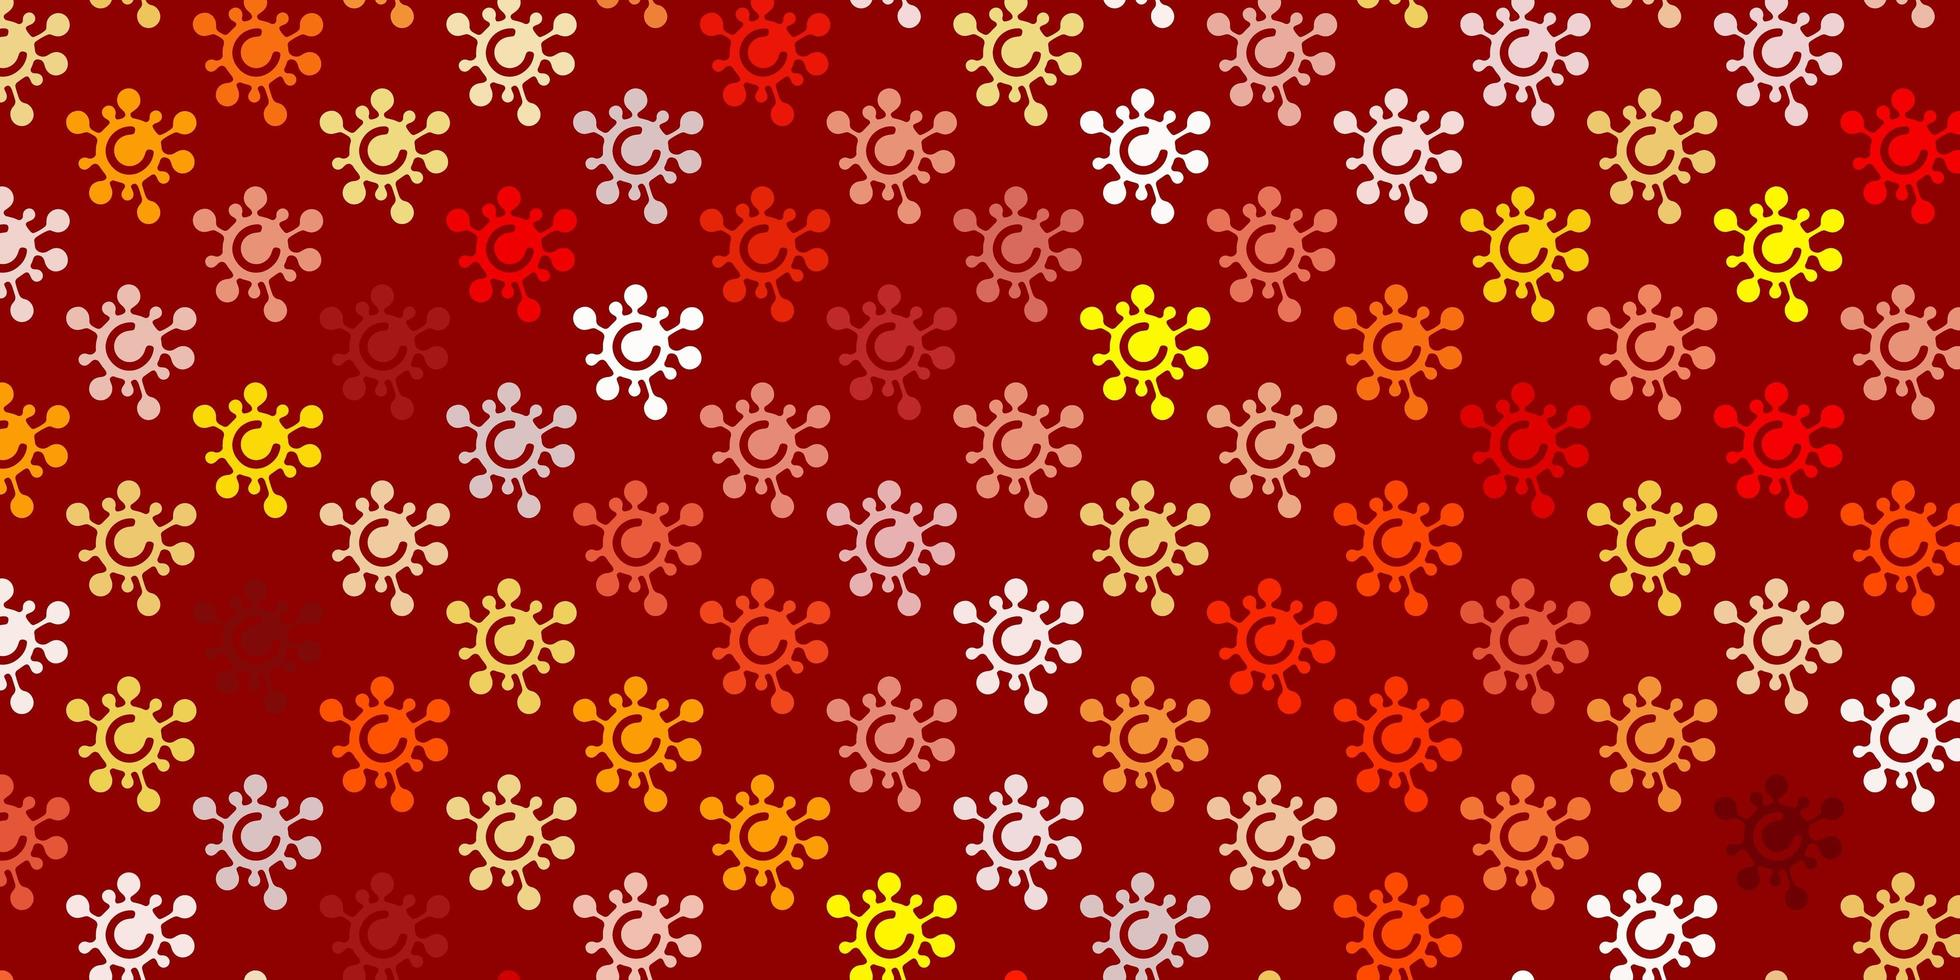 textura naranja claro con símbolos de enfermedades vector